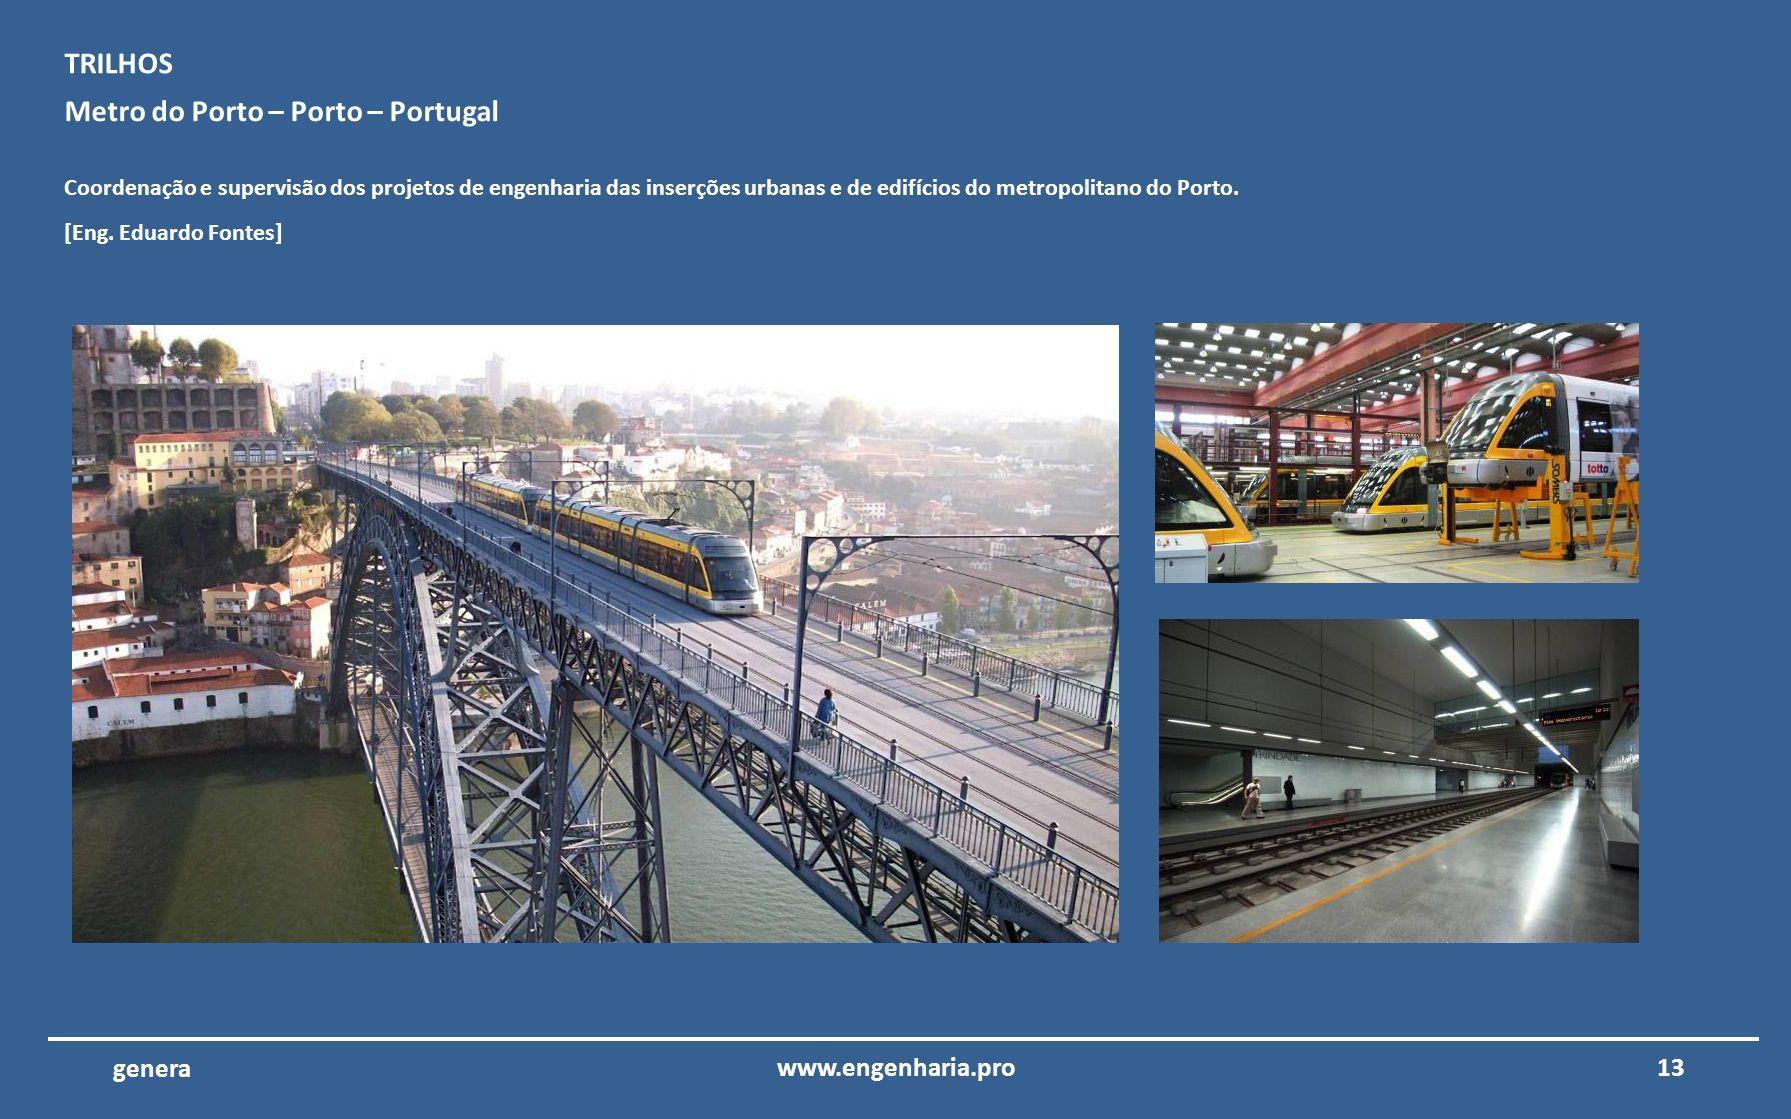 Metro do Porto – Porto – Portugal